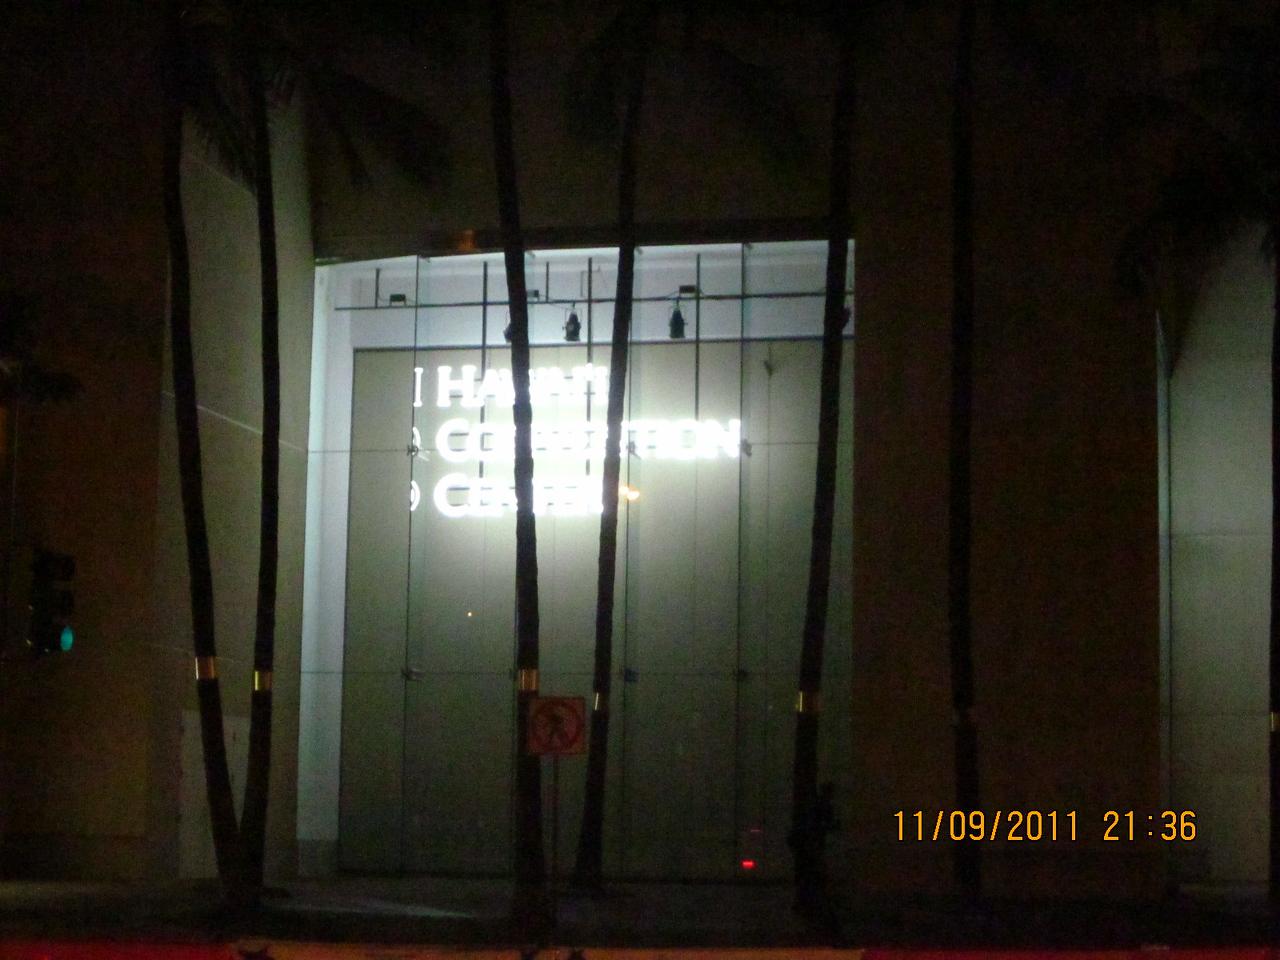 Hawaii Convention Center where APEC took place